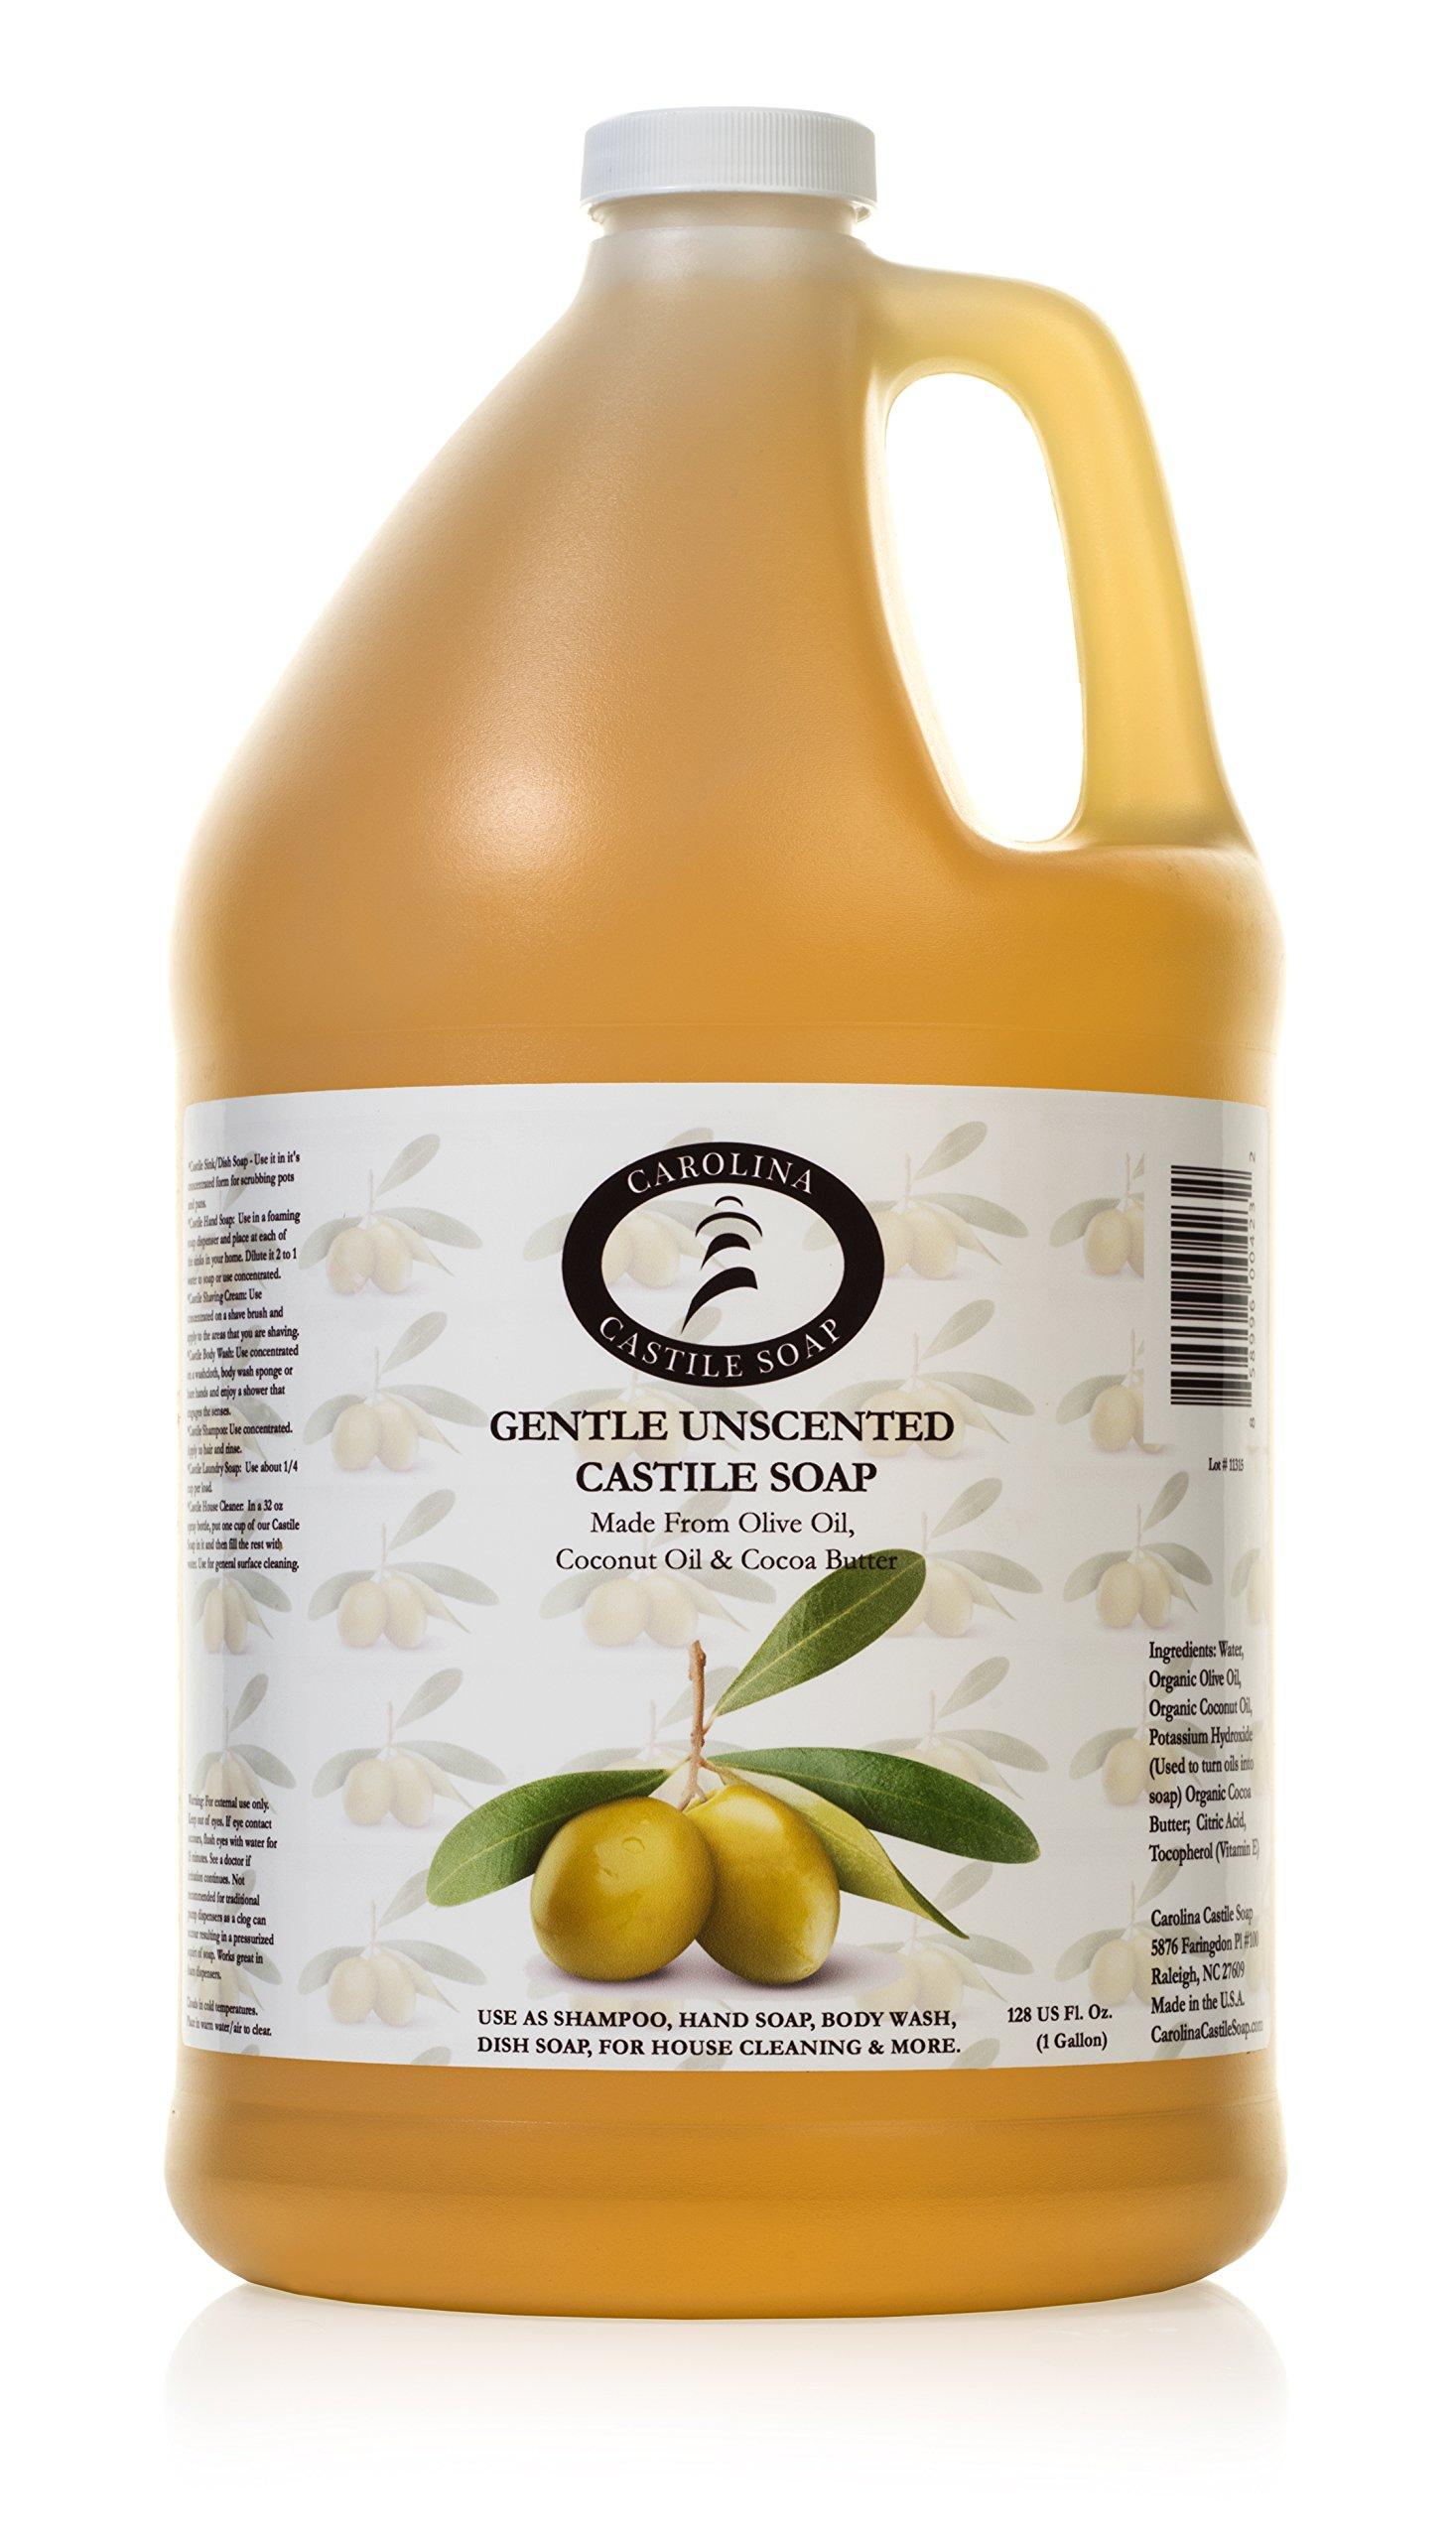 Castile Soap Liquid Unscented - 1 Gallon - Vegan & Pure Organic Soap - Carolina Castile Soap - Concentrated Non Drying All Natural Formula Good For Sensitive Skin by Carolina Castile Soap